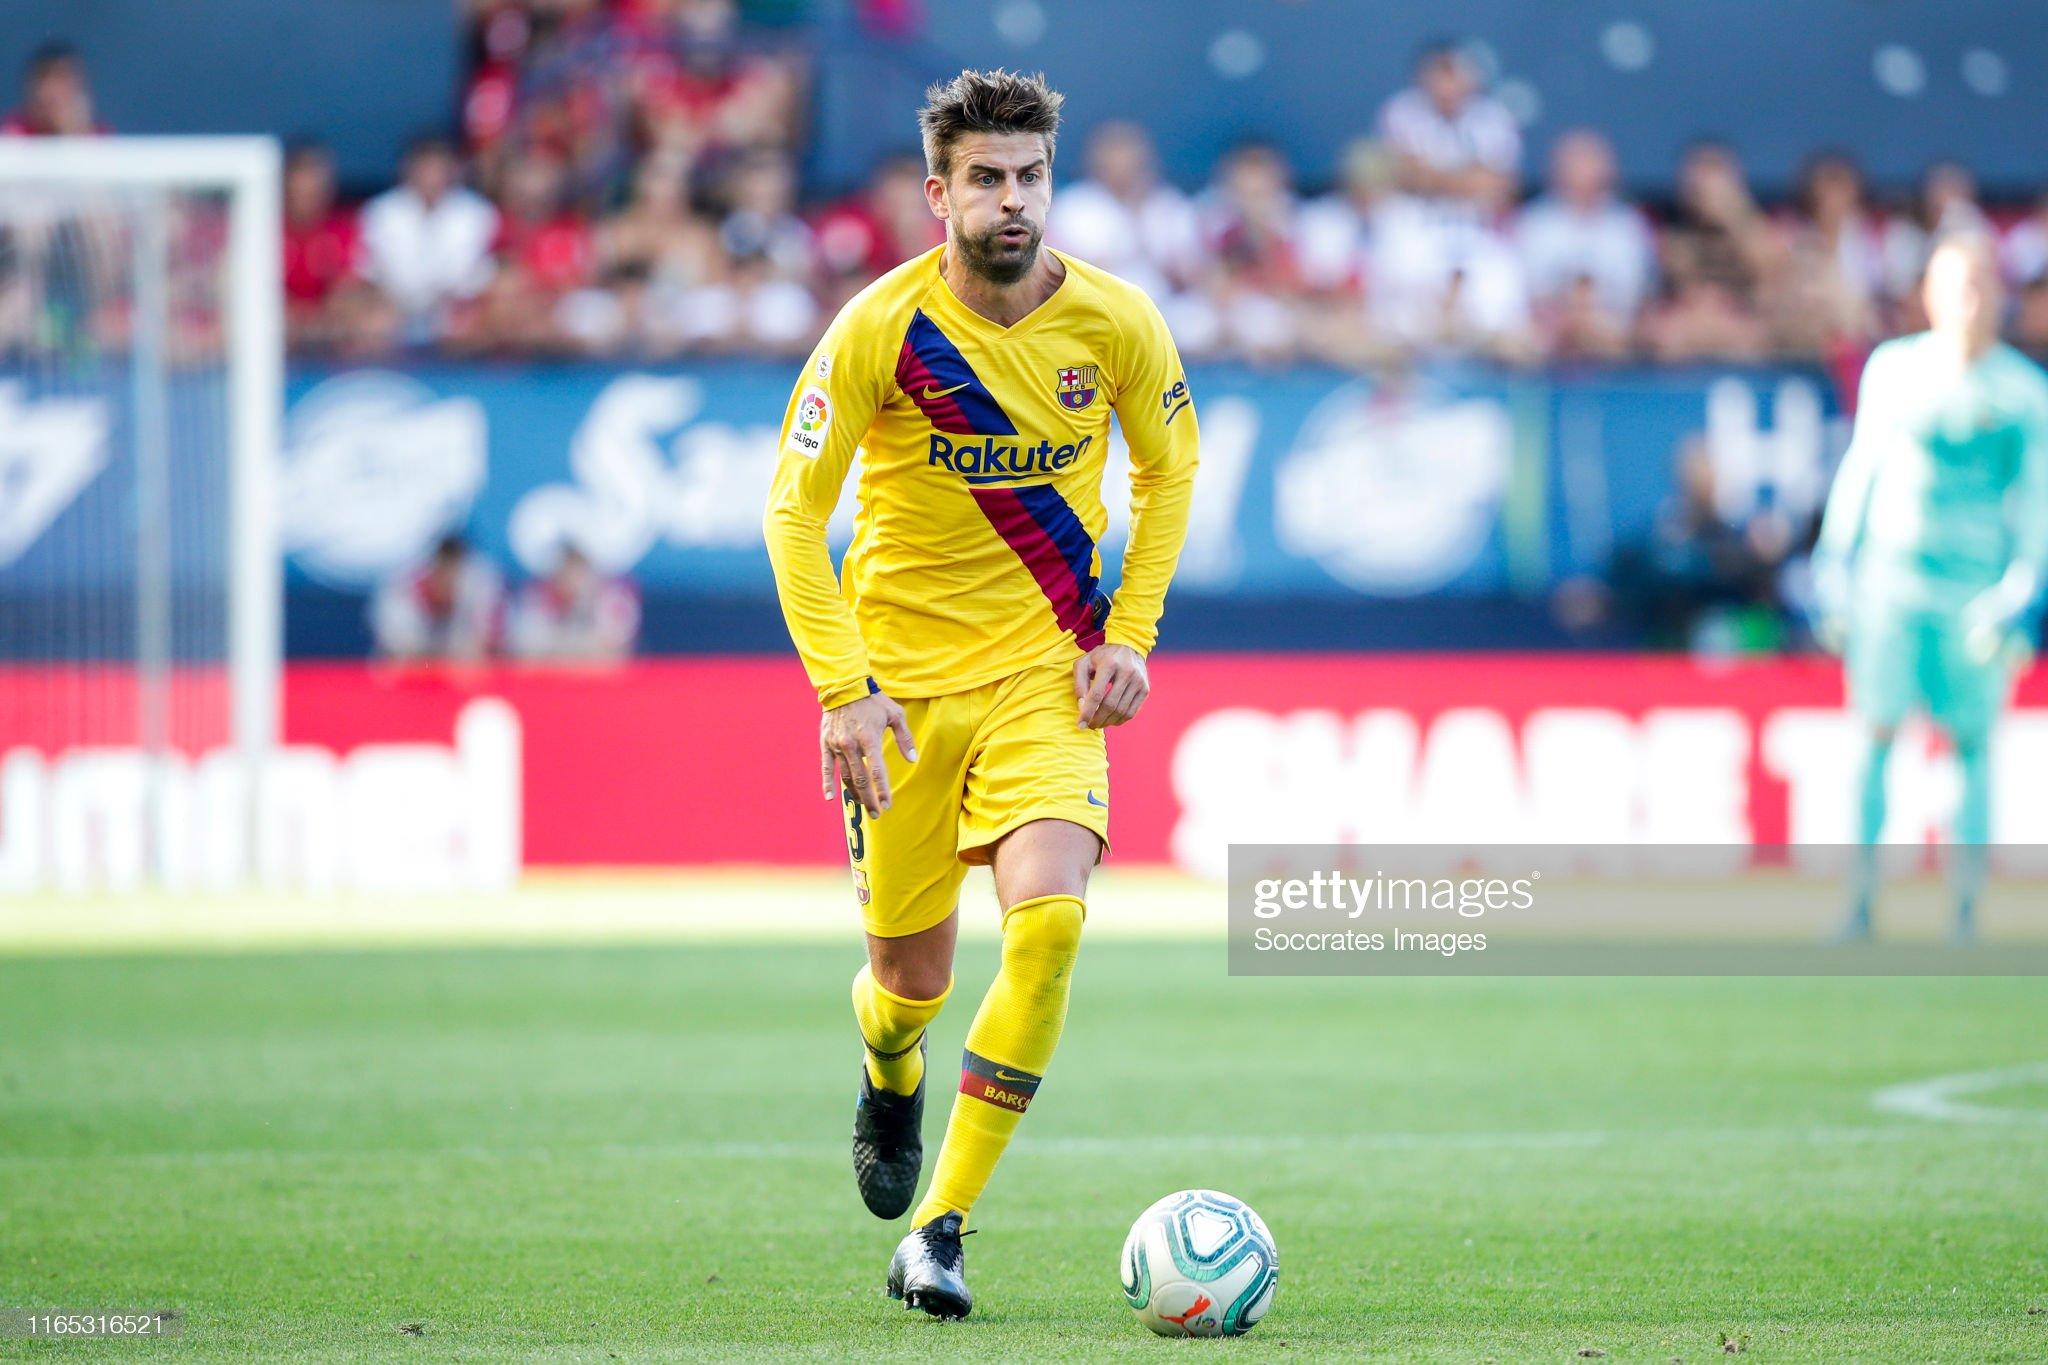 صور مباراة : أوساسونا - برشلونة 2-2 ( 31-08-2019 )  Gerard-pique-of-fc-barcelona-during-the-la-liga-santander-match-v-picture-id1165316521?s=2048x2048